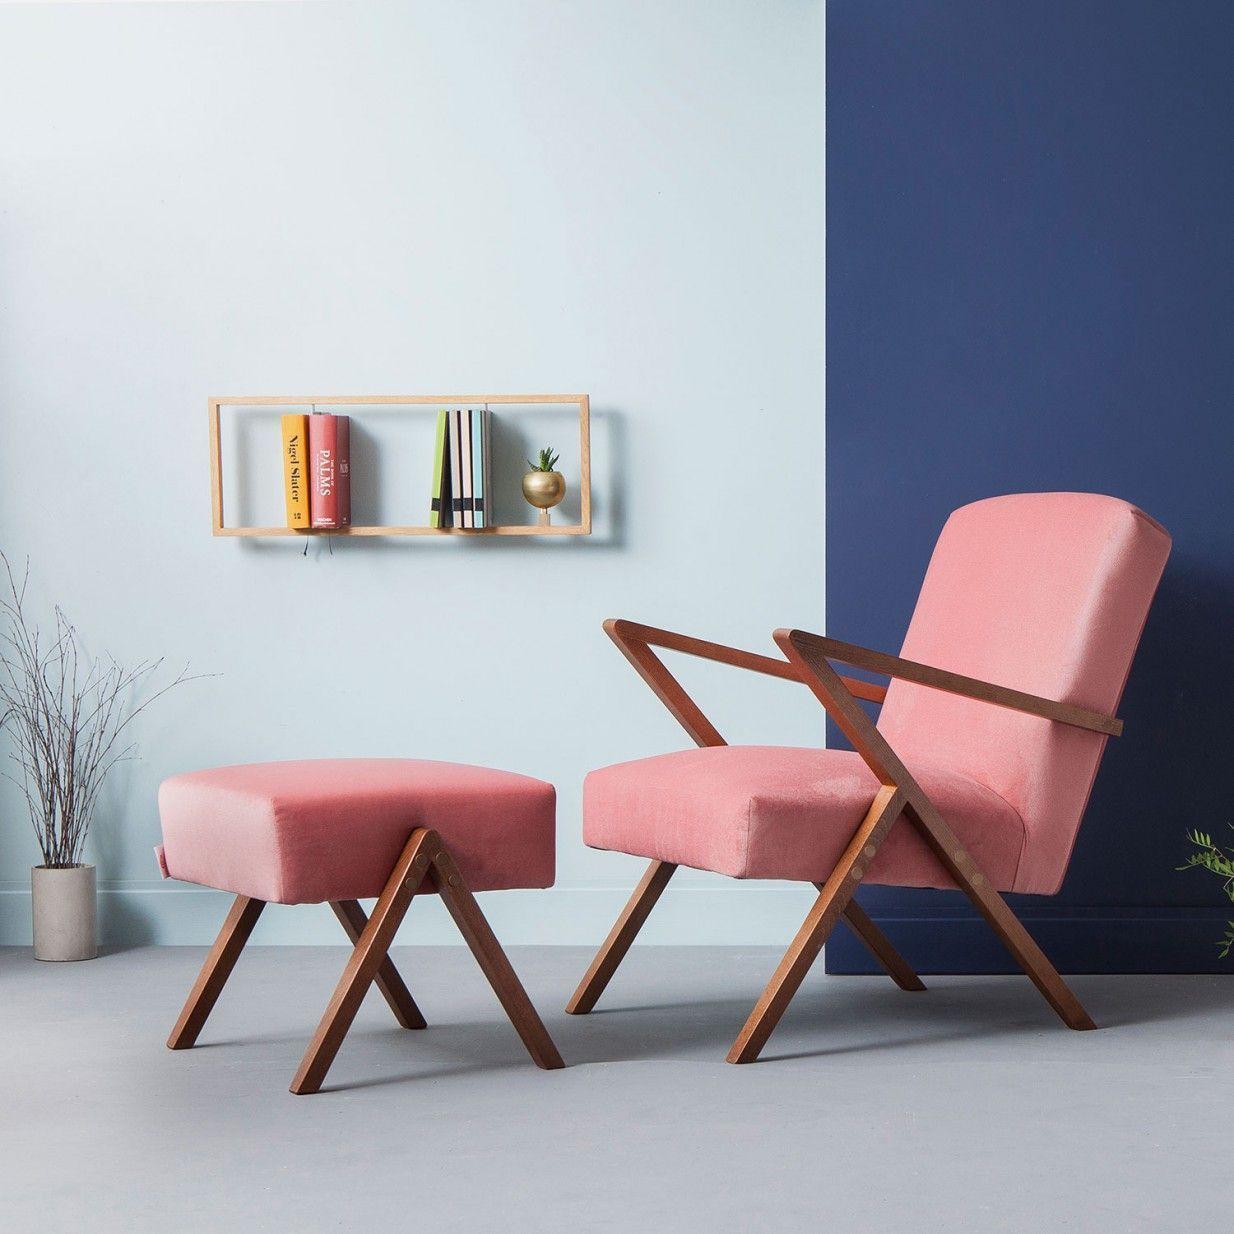 Retrostar Samt Sessel Rosa Sternzeit Design Der Retrostar Lounge